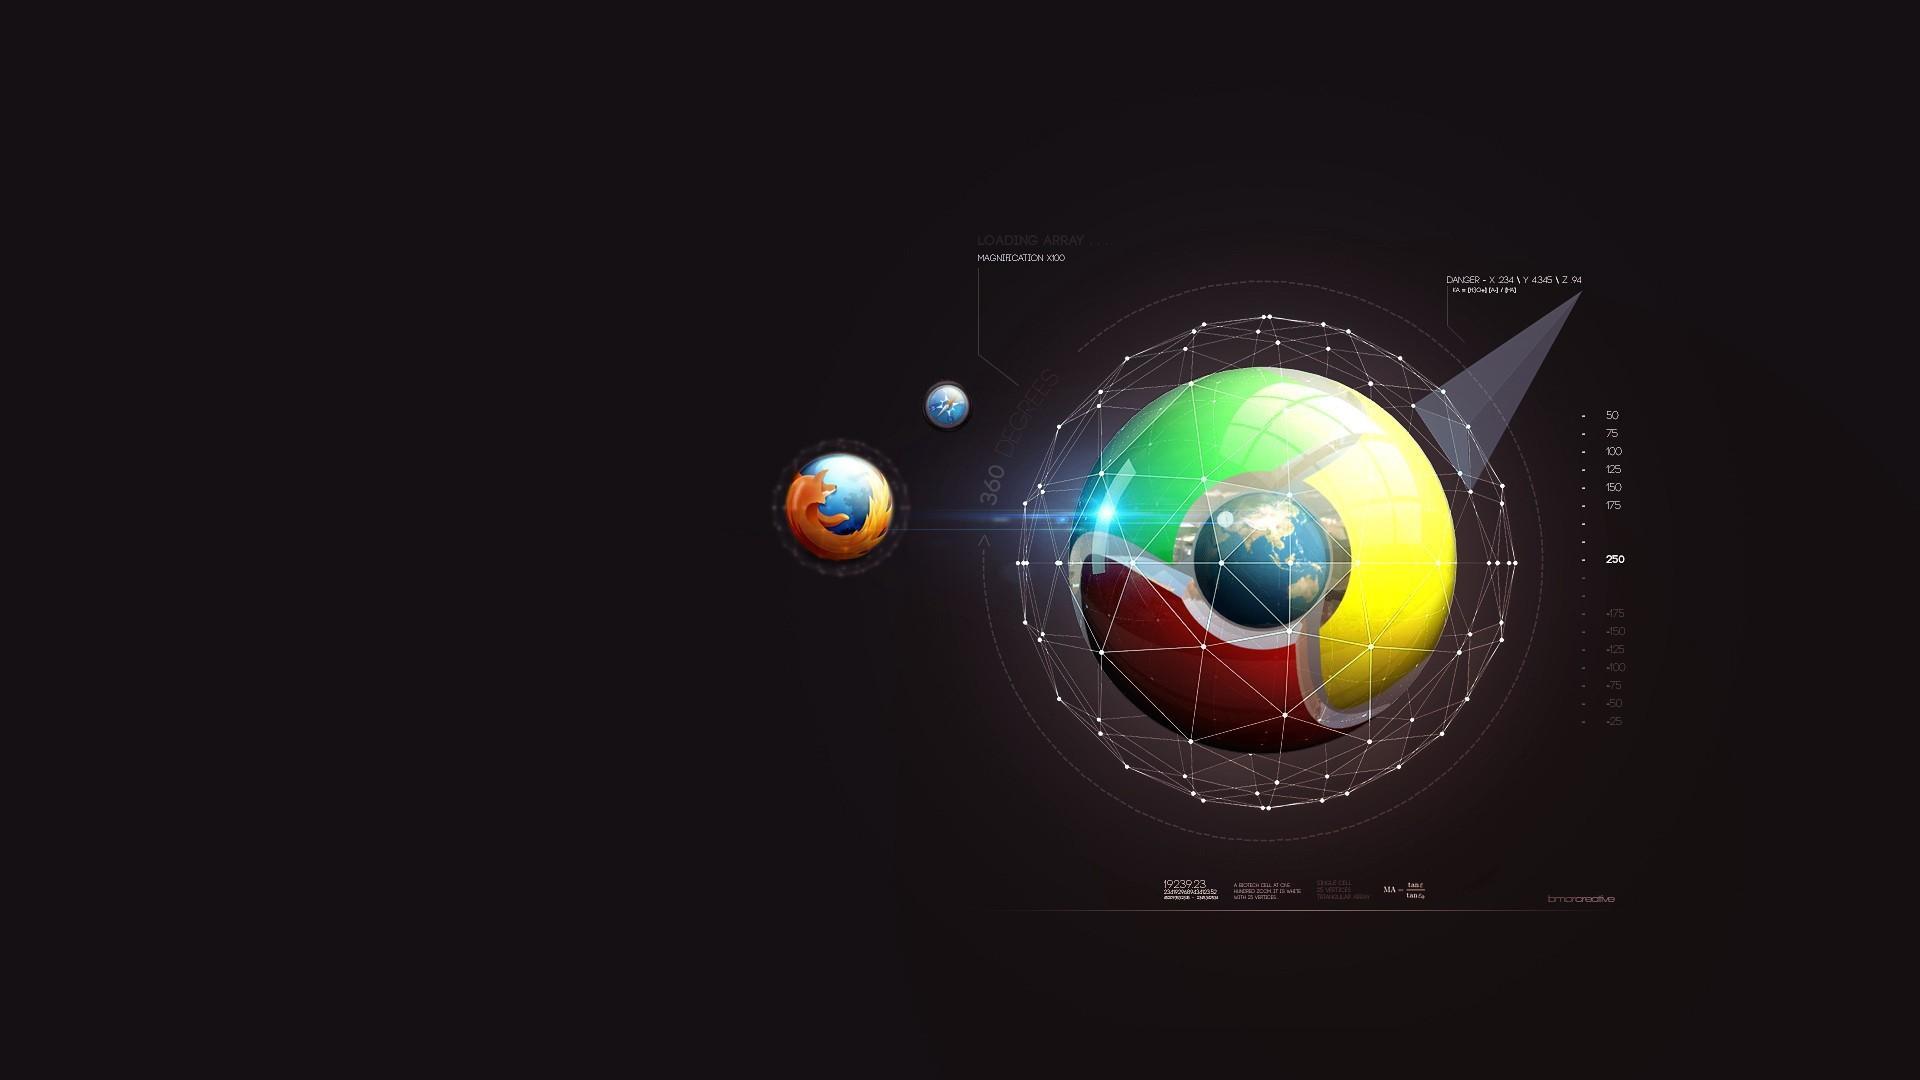 Chrome wallpapers 4k hd wallpapers pulse - Google chrome 3d home design app ...